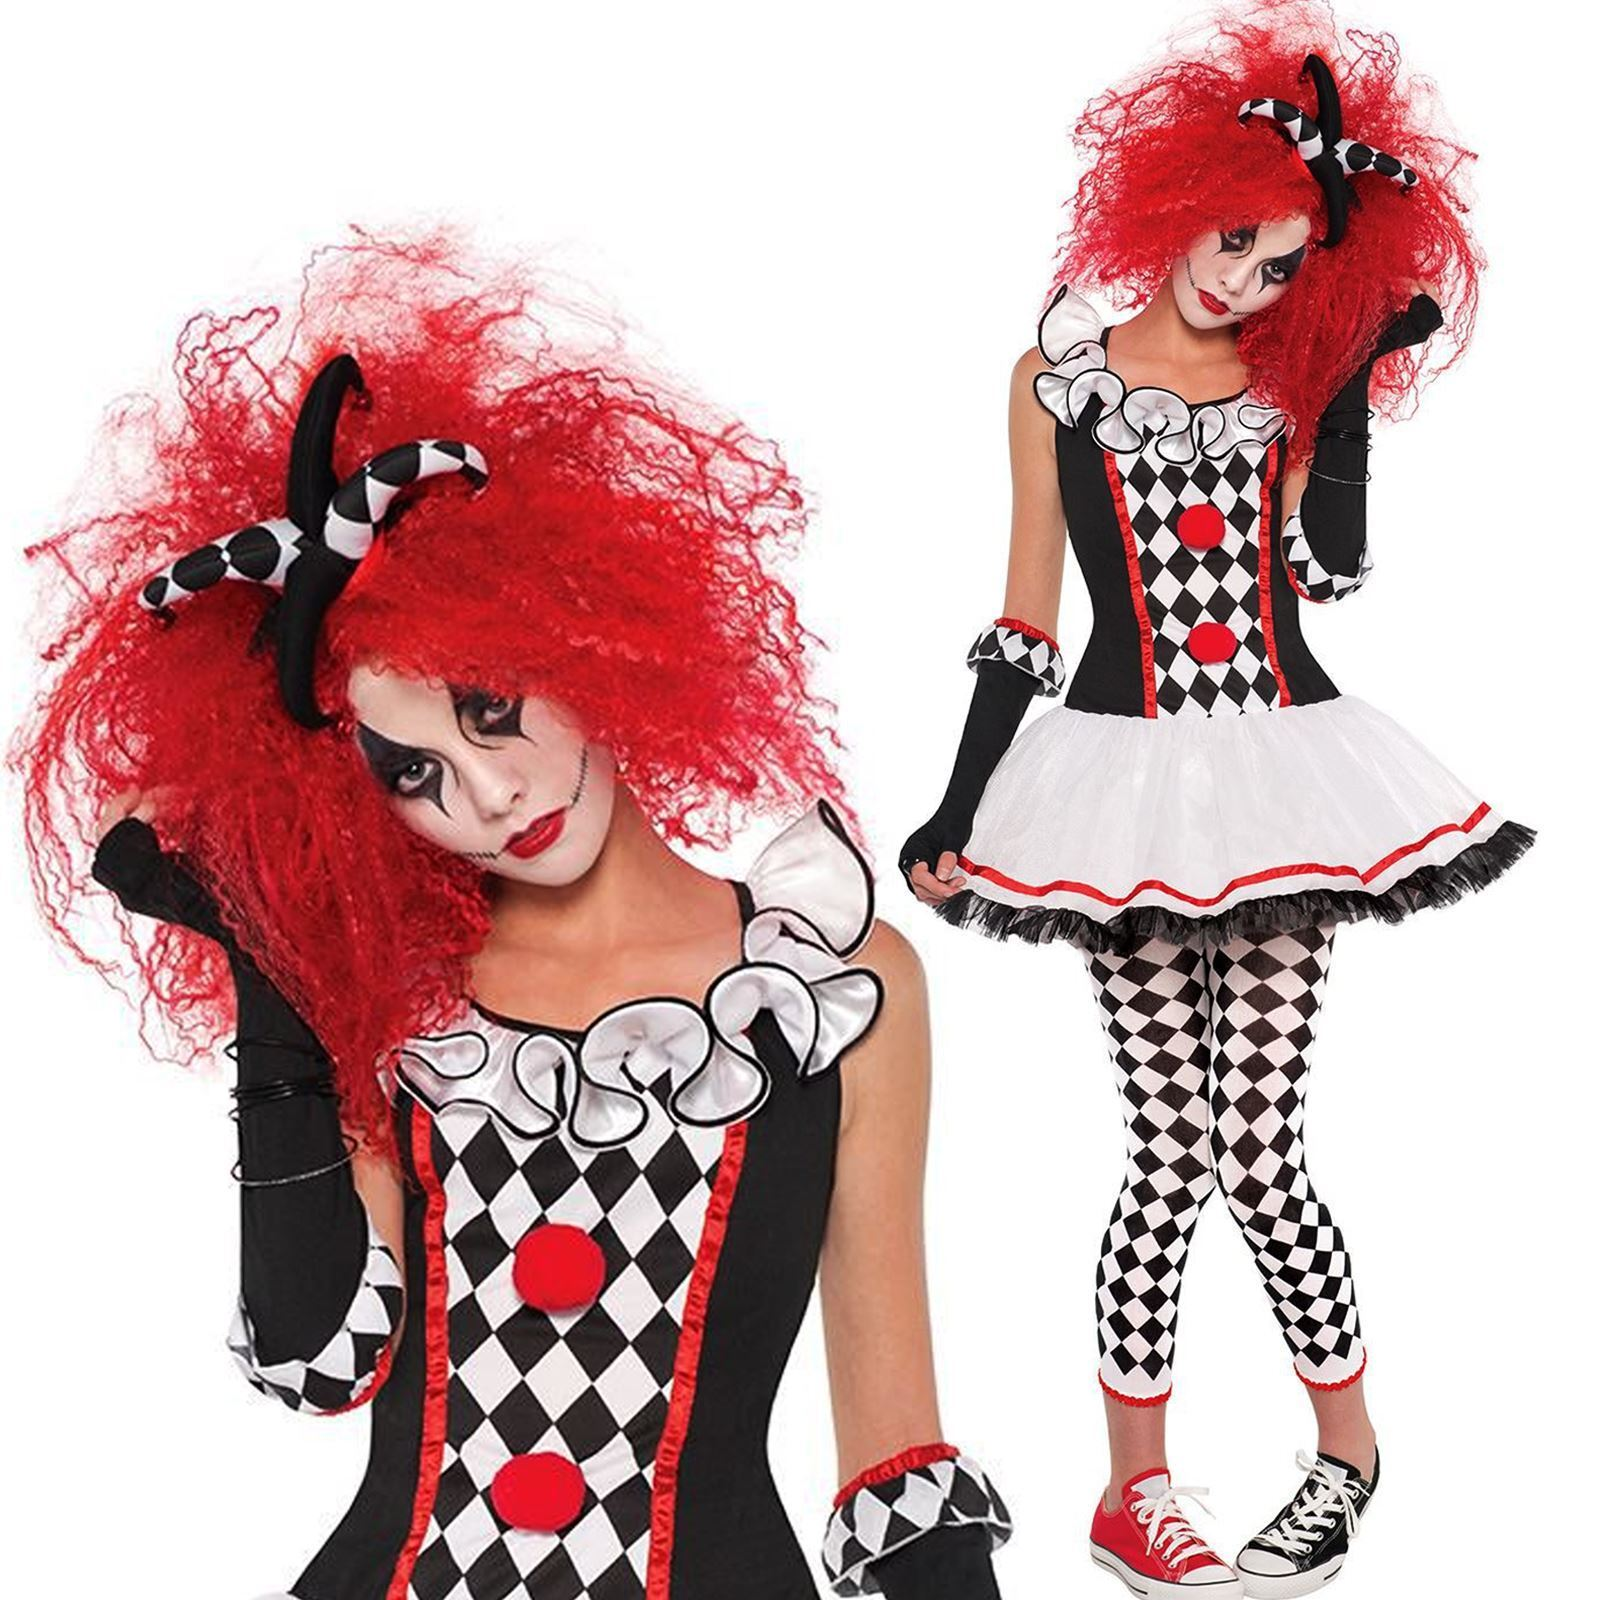 Harlequin Honey Jester Halloween Fancy Dress Costume Women Clown Outfit